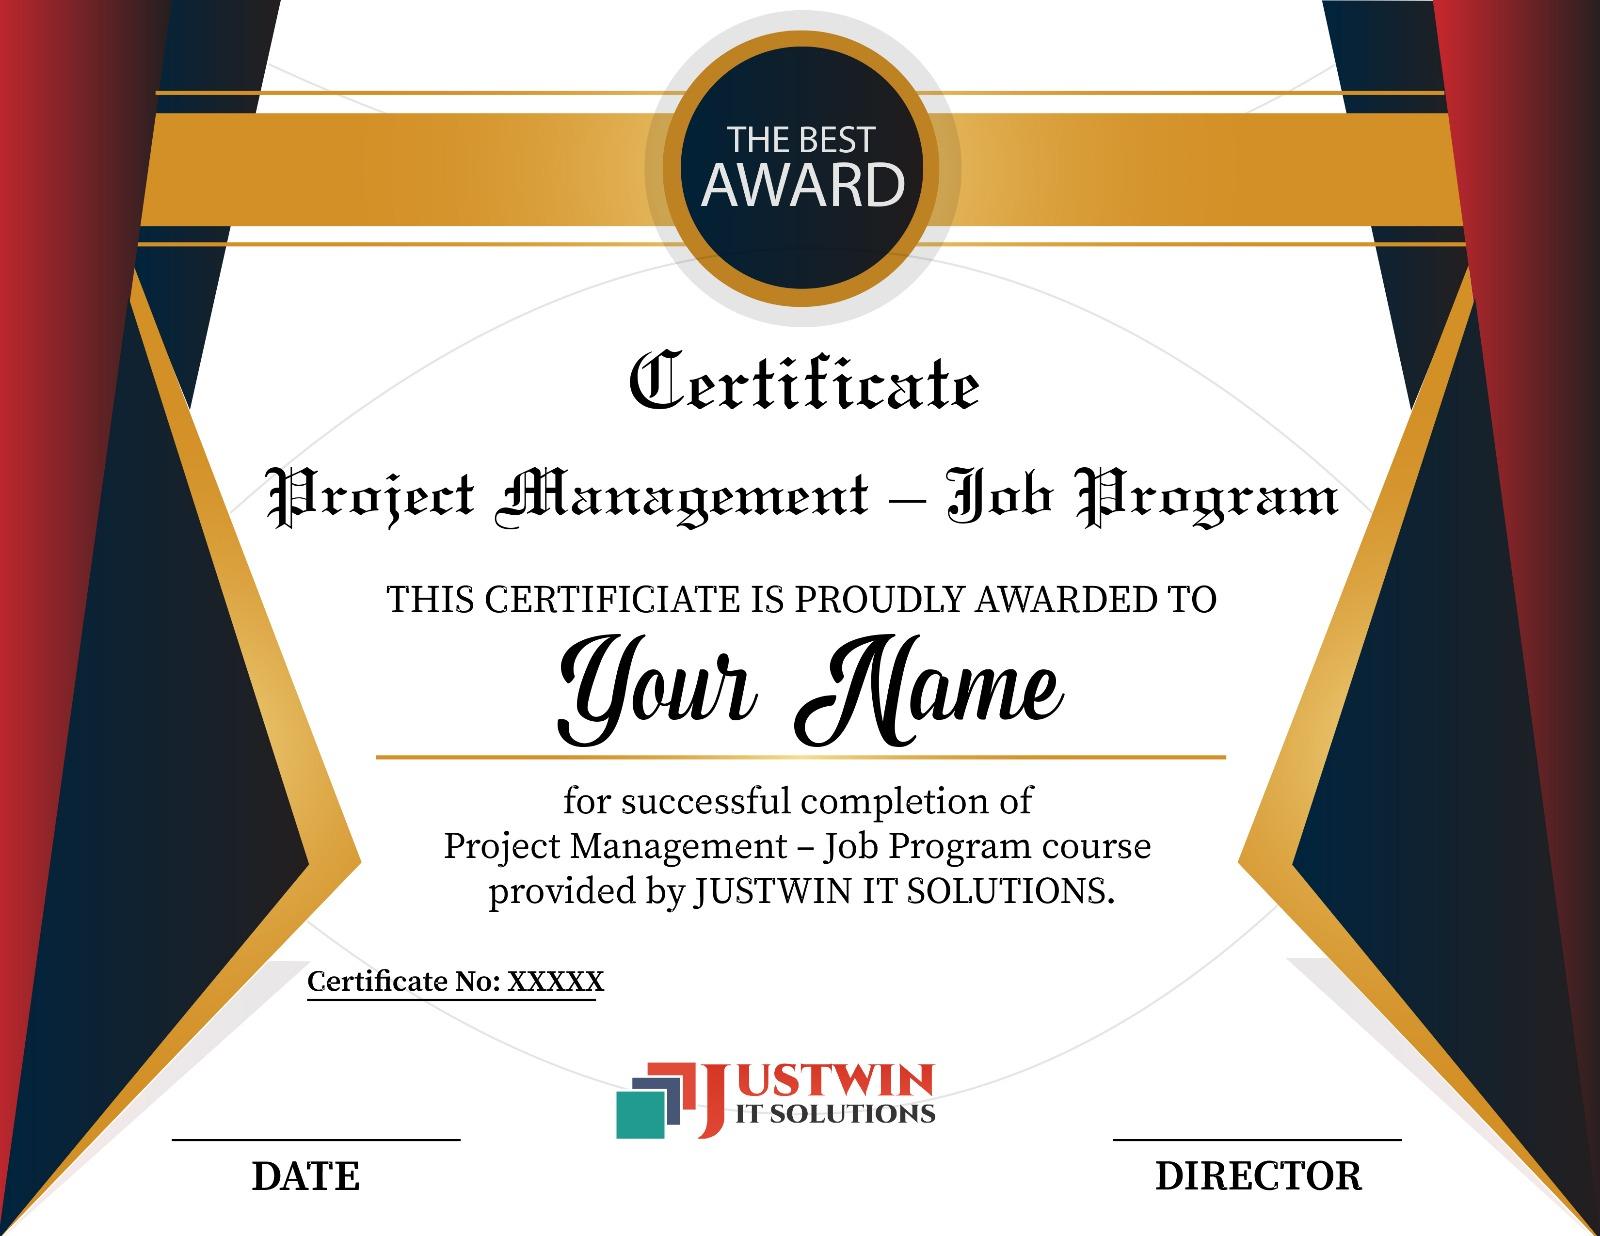 Project Management Jobs Project Management Programtraining